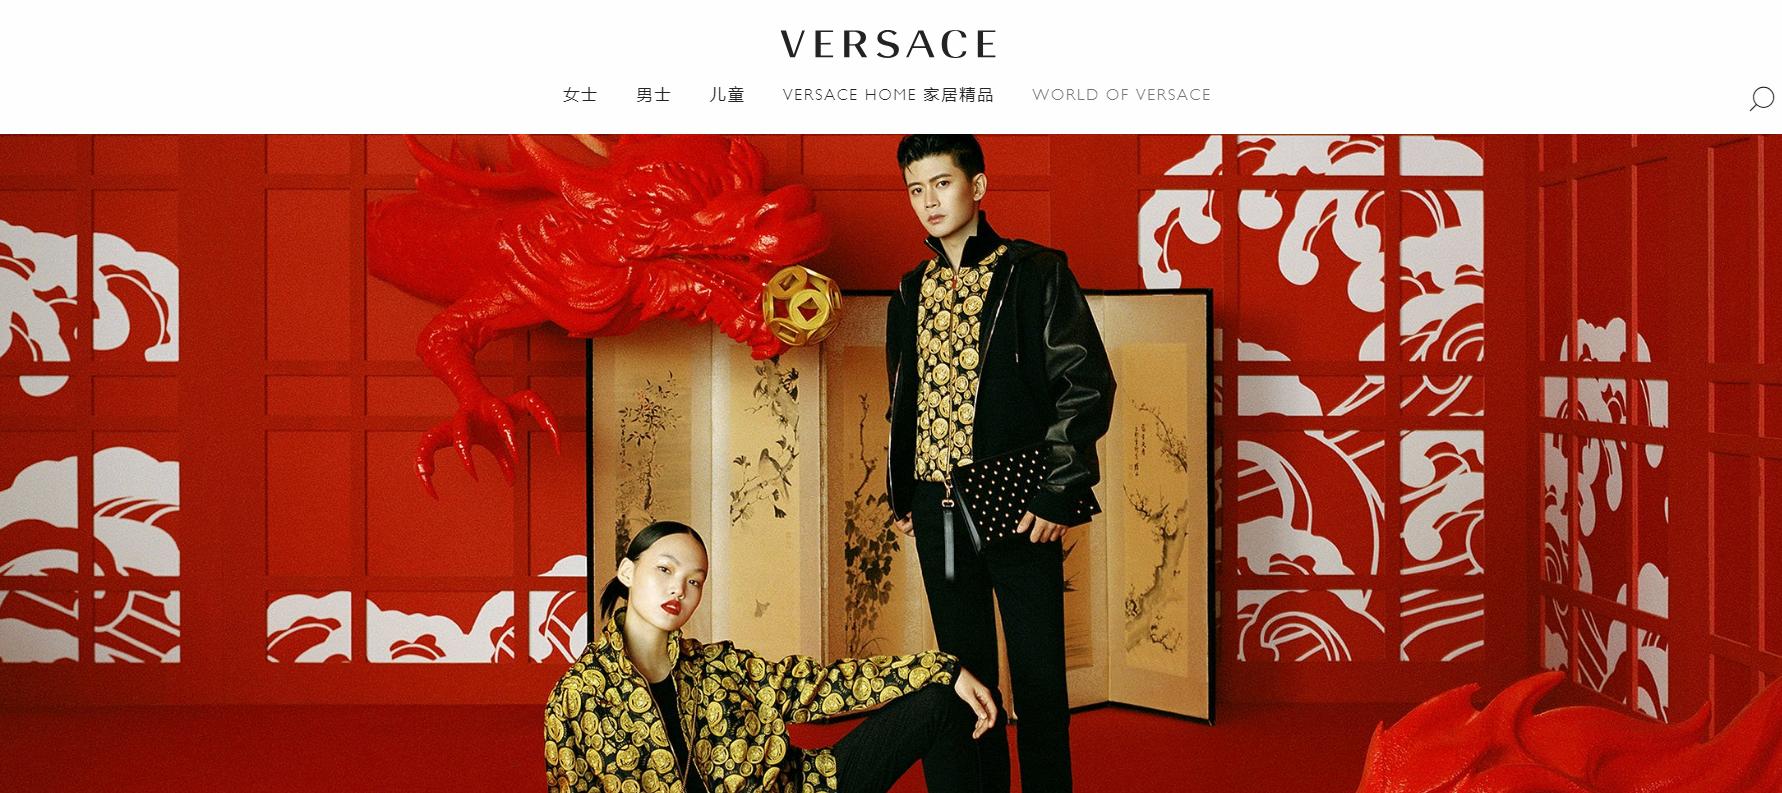 Coach 的母公司 Tapestry 最新季报:中国销售增长超30%,集团利润超过预期